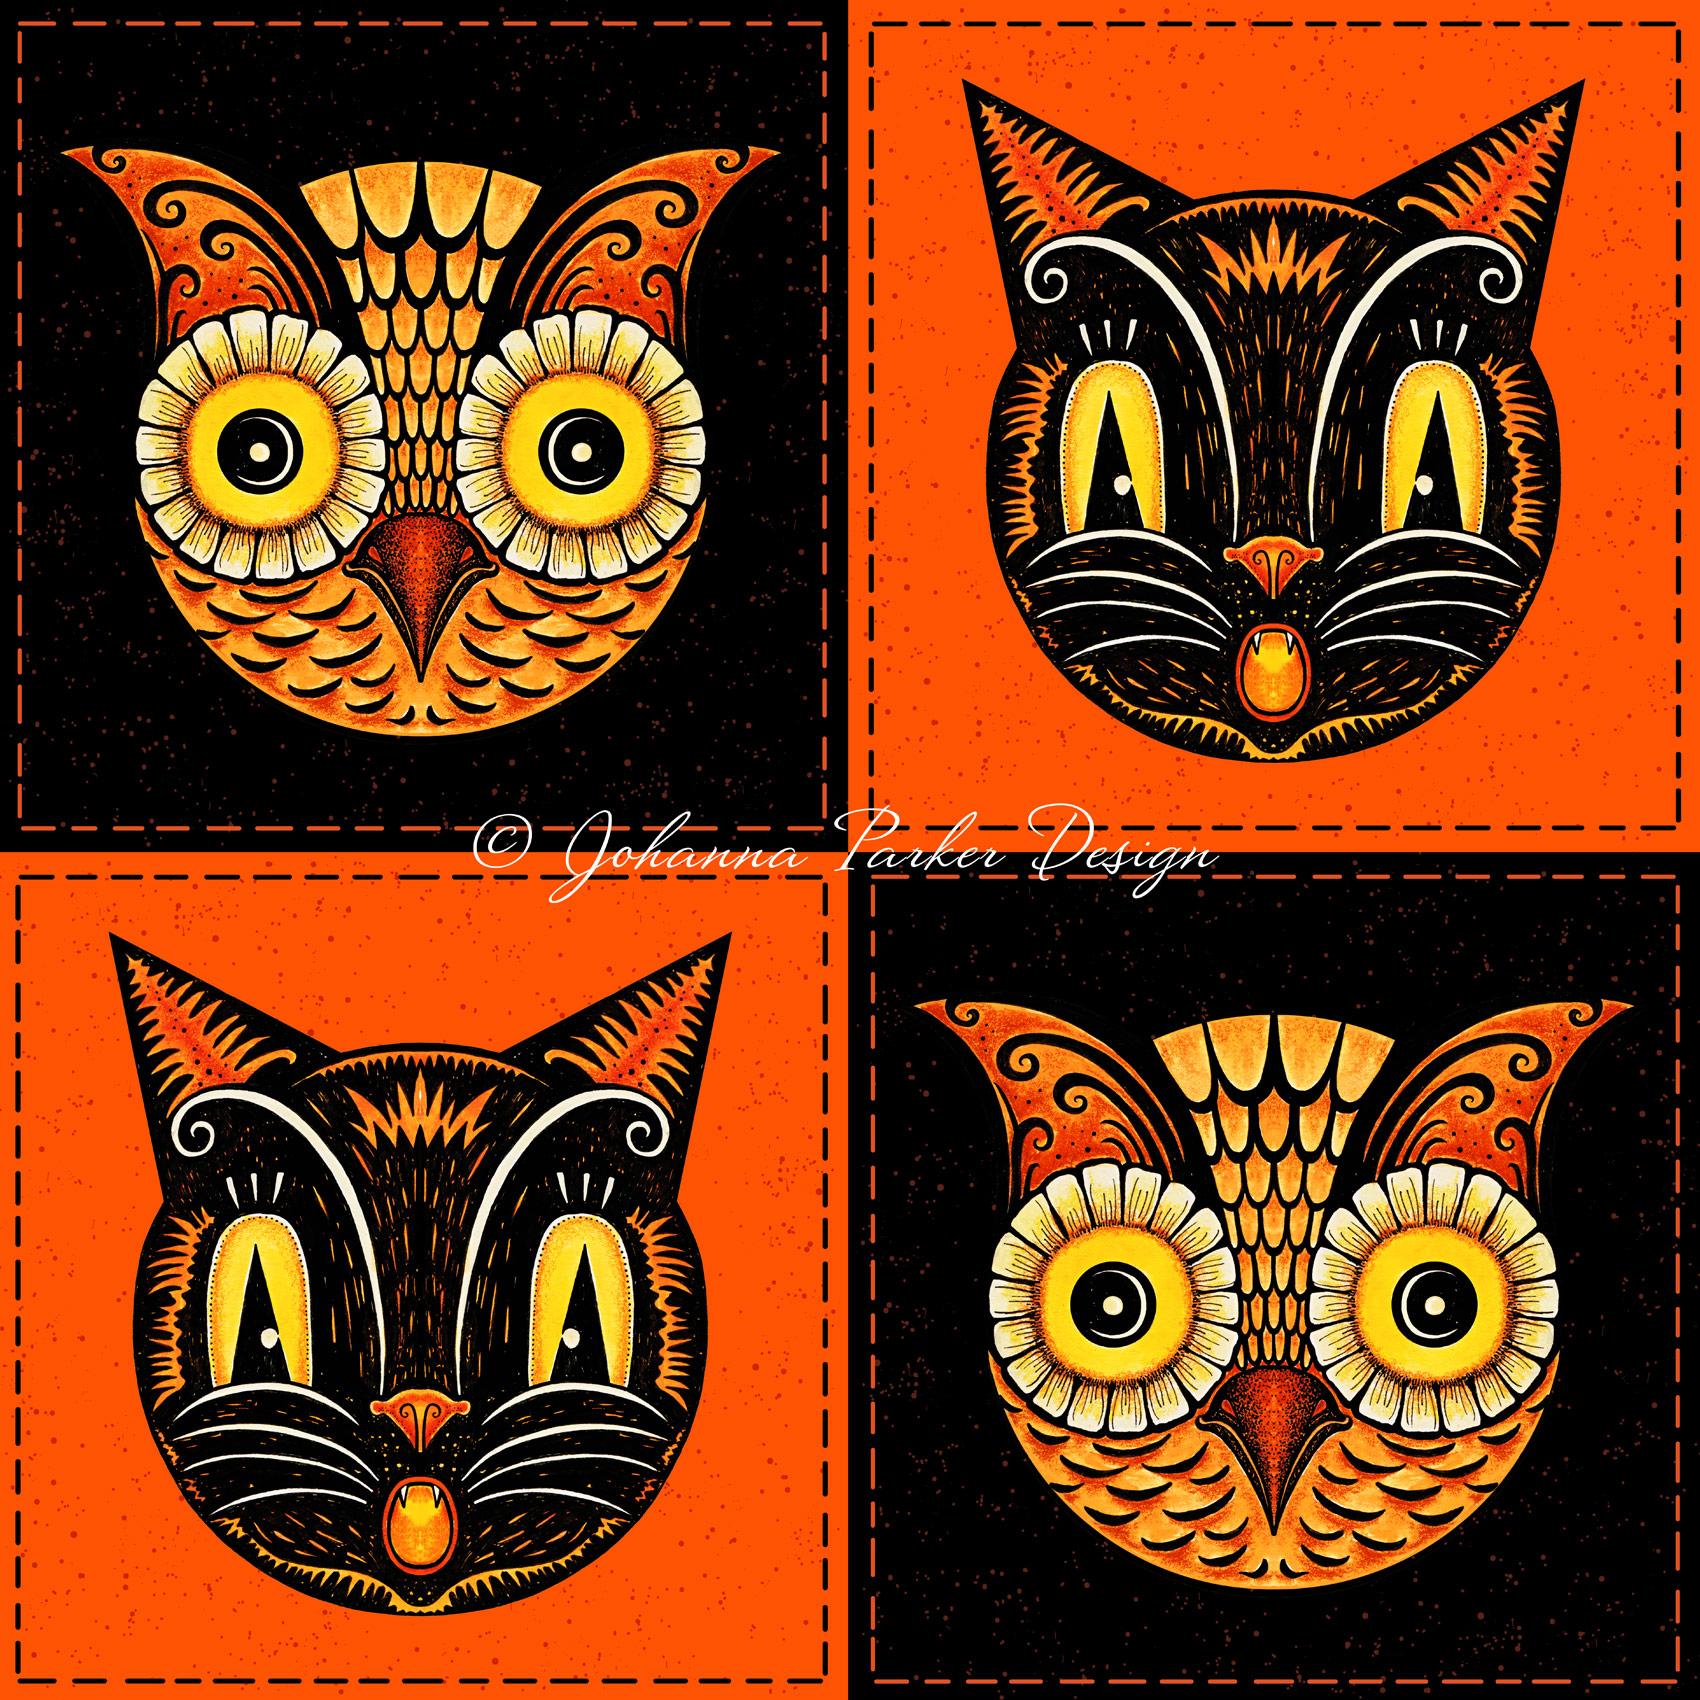 Round owl & cat checkerboard